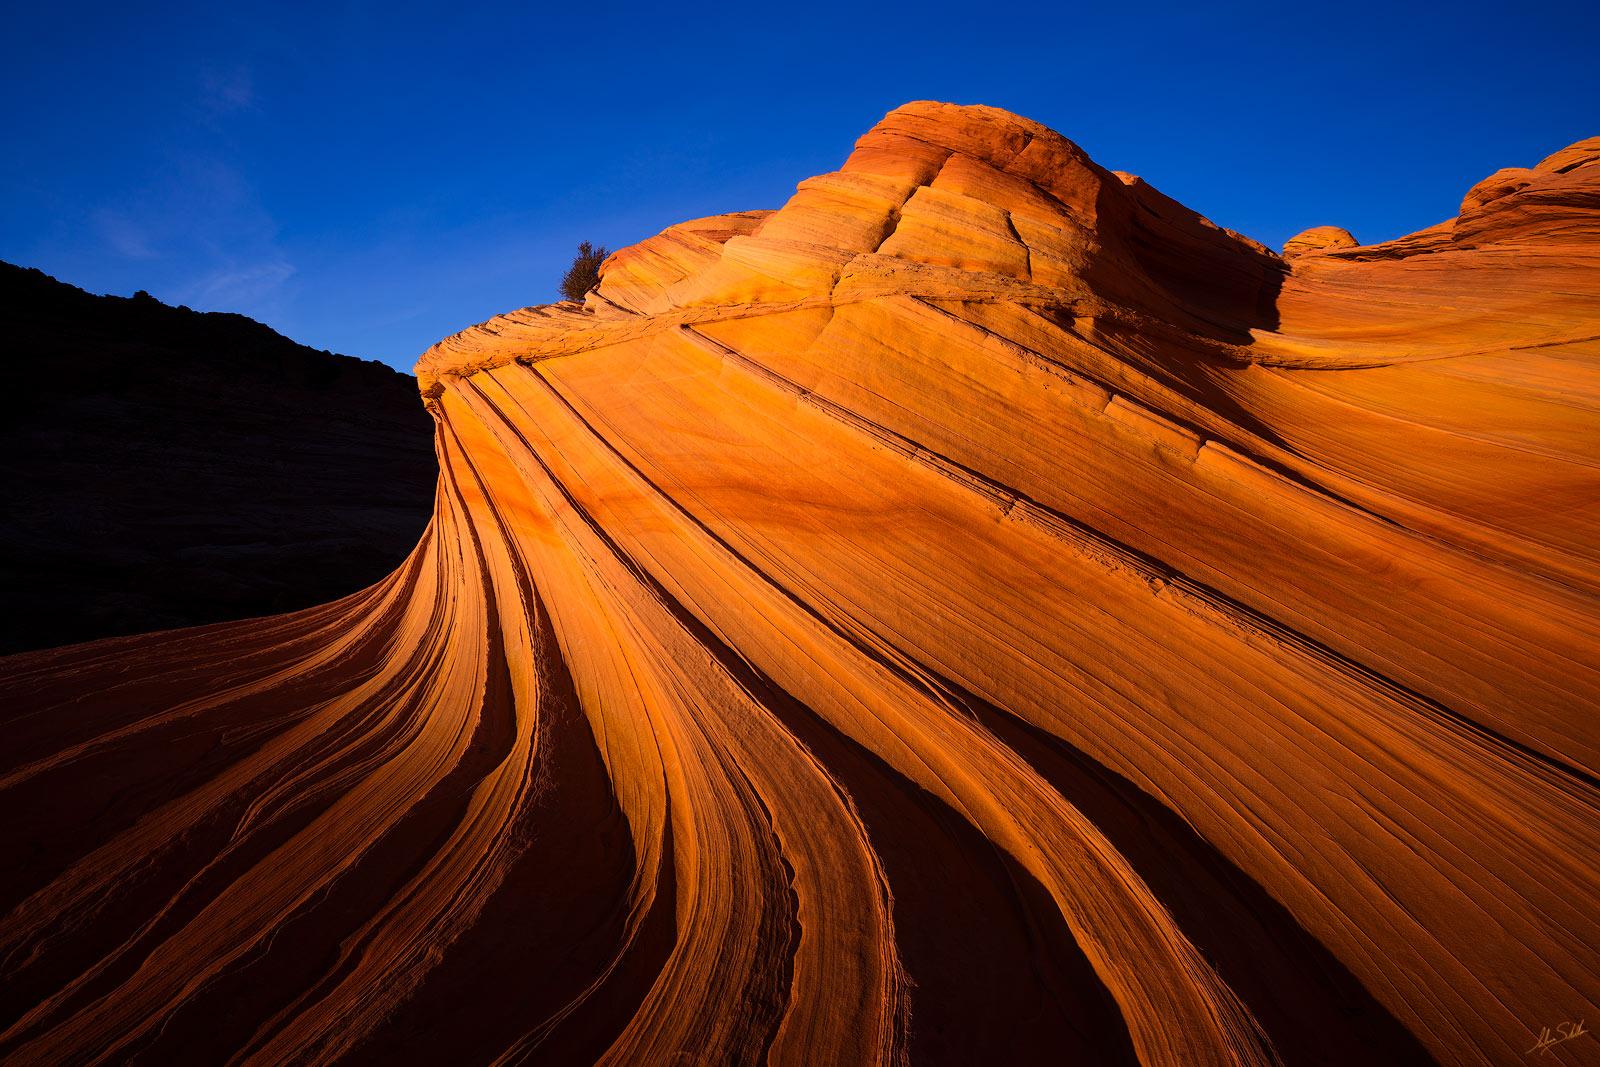 American Southwest, AZ, Arizona, Arizona Strip, Black & White, Coyote Buttes, Coyote Buttes North, Erosion, Geology, National Monument, Northern Arizona, Sandstone, Second Wave, Southwest, The Wave, V, photo